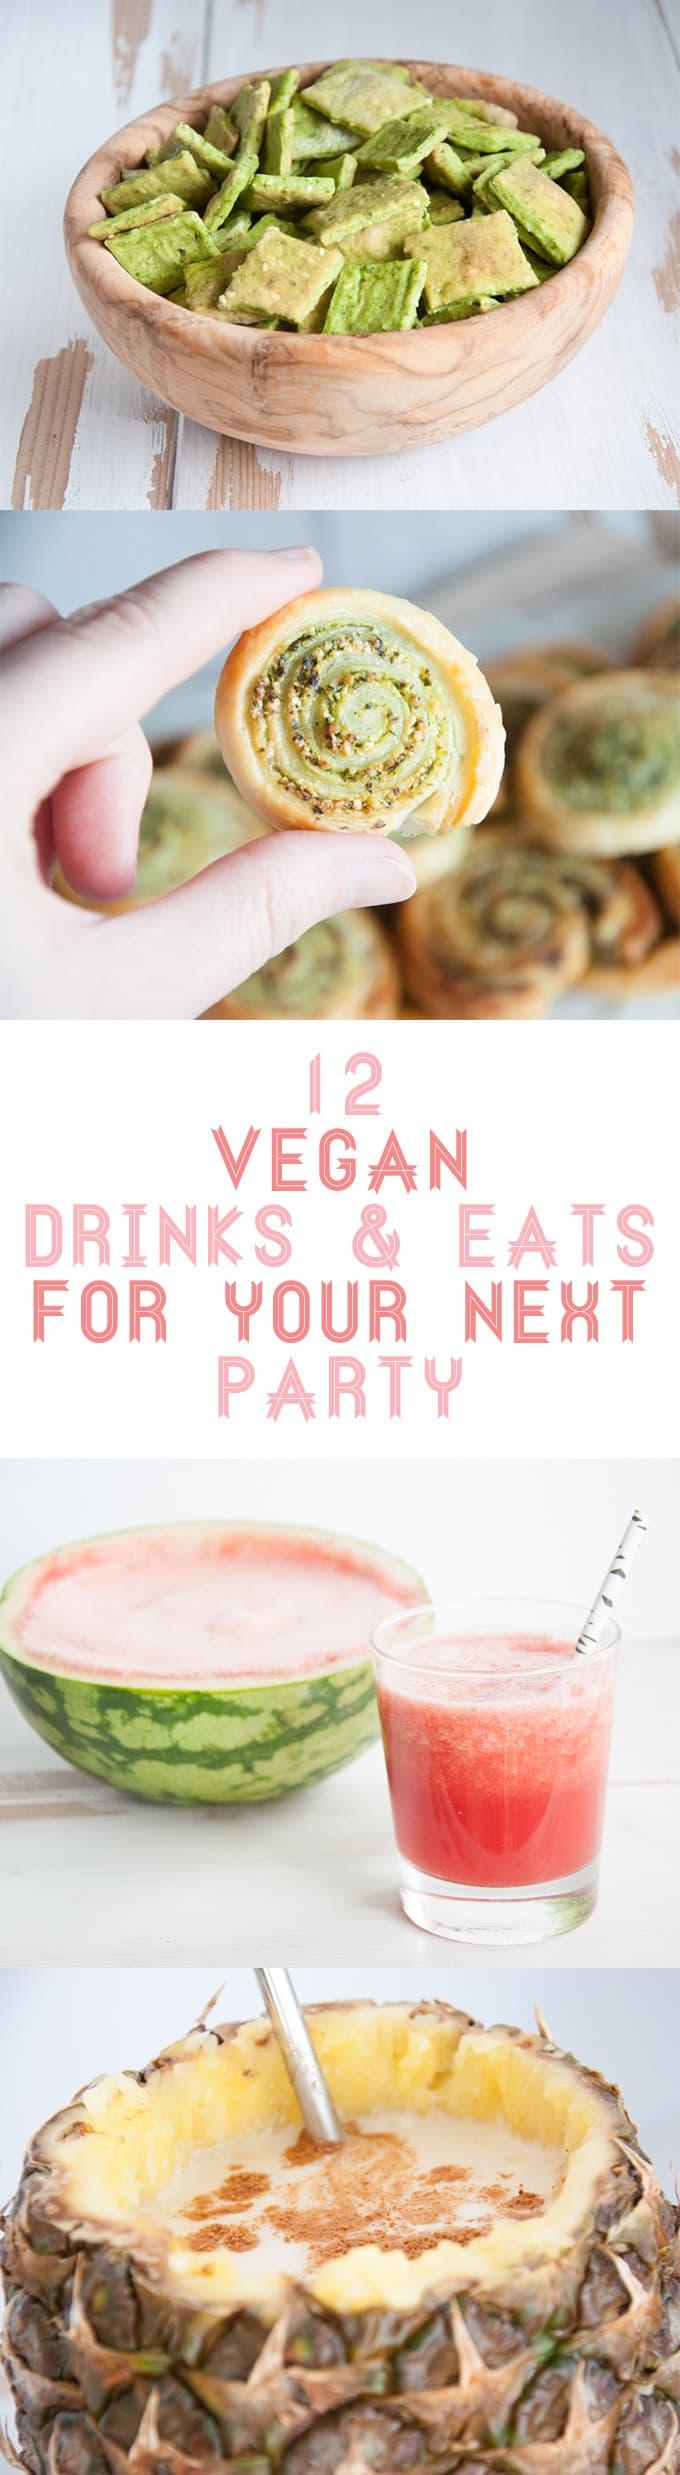 12 Vegan Drinks & Eats for your next party | ElephantasticVegan.com